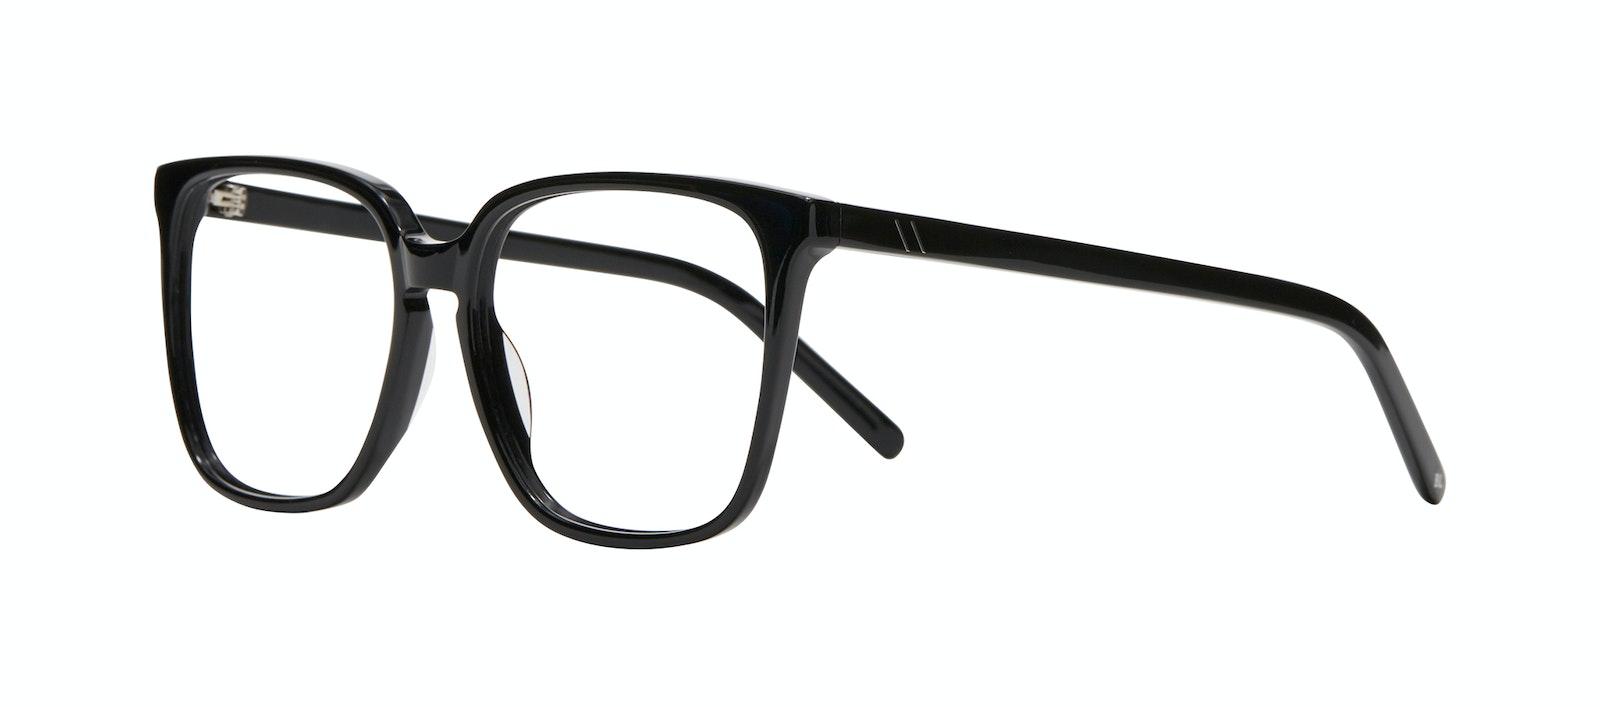 Affordable Fashion Glasses Square Eyeglasses Women Runway Black Tilt